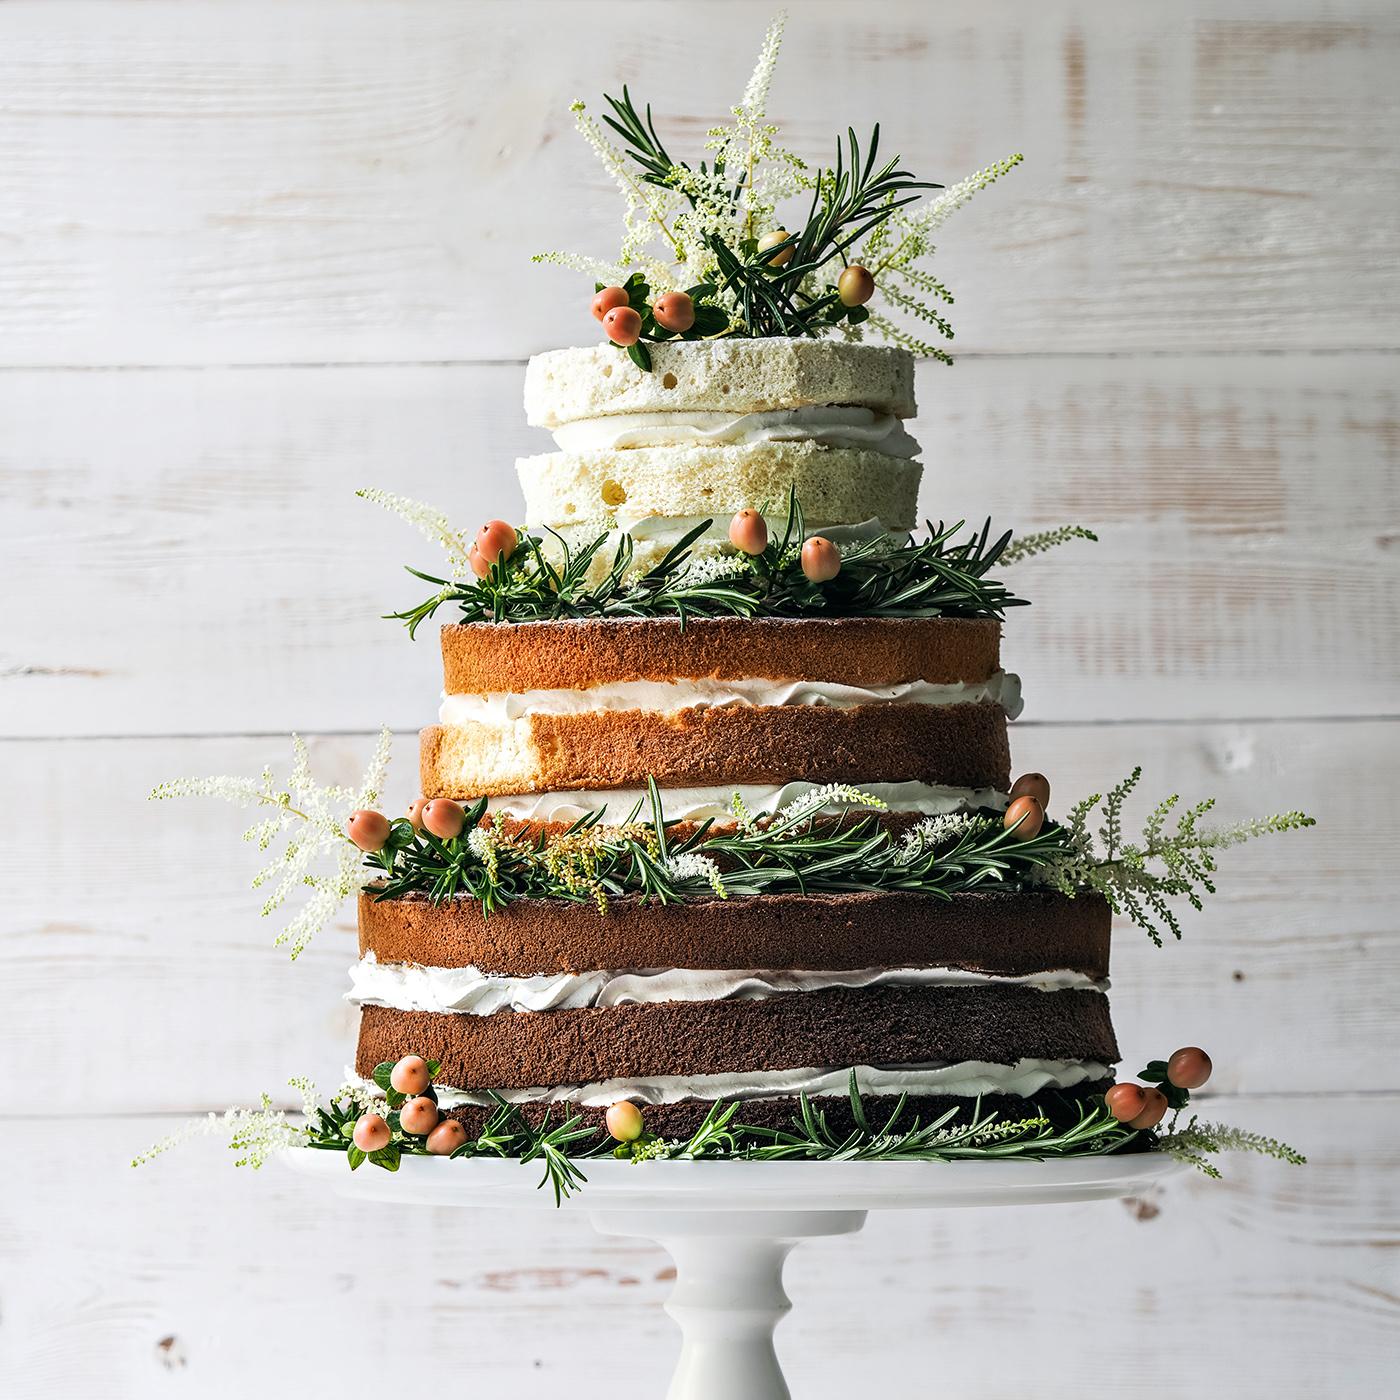 decorated_cake_2.jpg